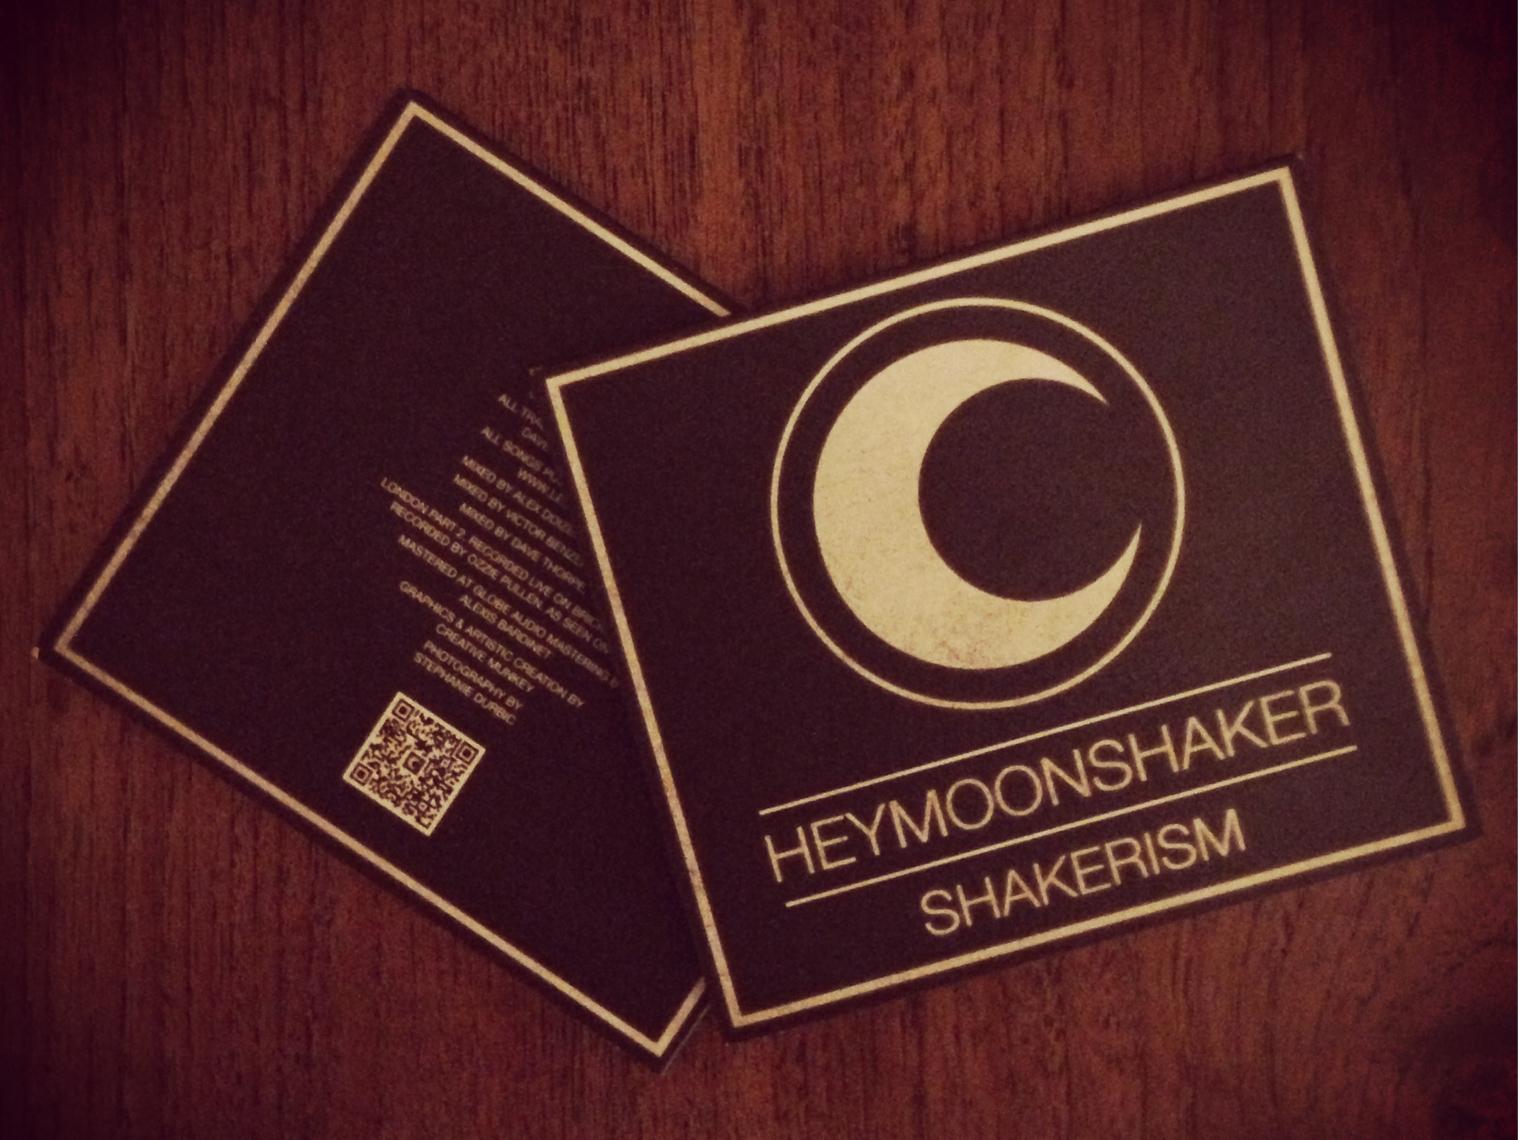 HEYMOONSHAKER Branding   Web Design Worcestershire & Herefordshire   Graphic Design Worcestershire & Herefordshire   e-Commerce Website Design   Website Designers Malvern, Worcestershire & Herefordshire   Design in the Shires